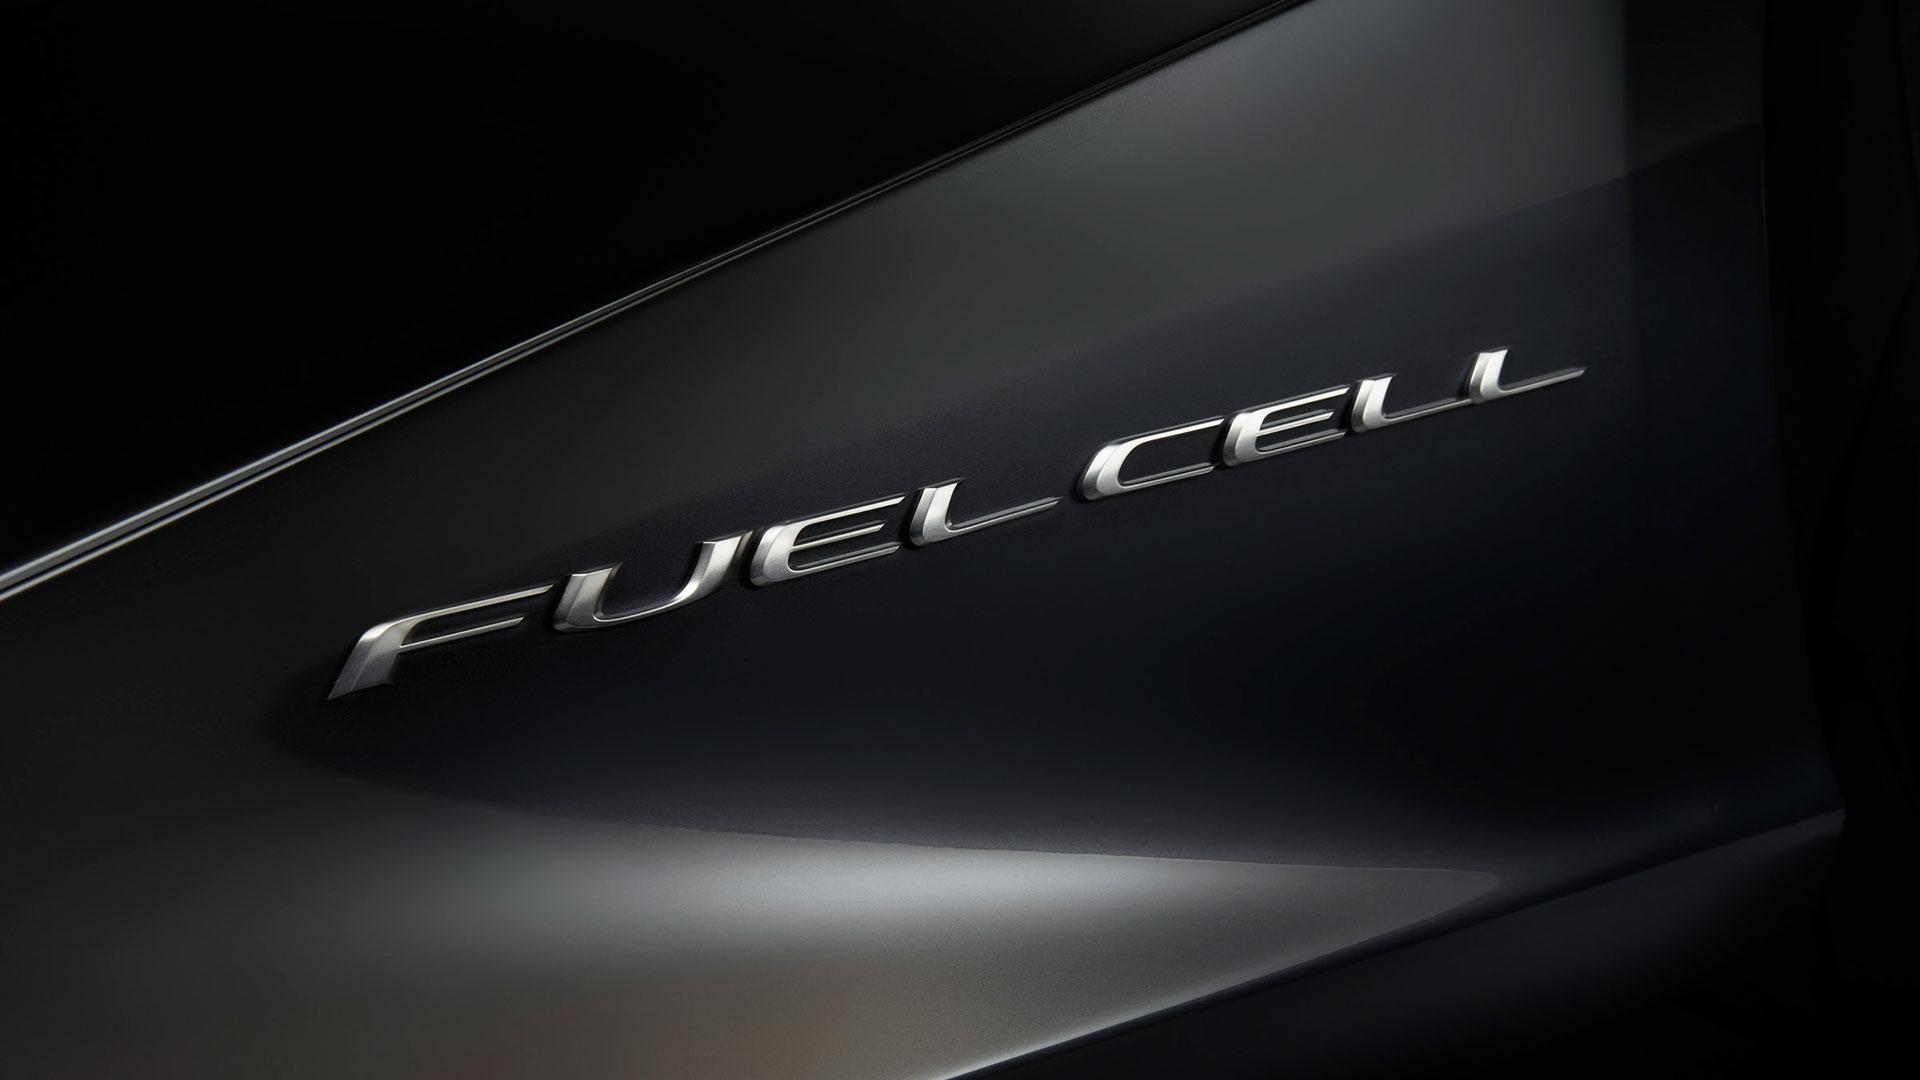 Lexus LF LC Hybrid Concept Sport Coupe hero asset